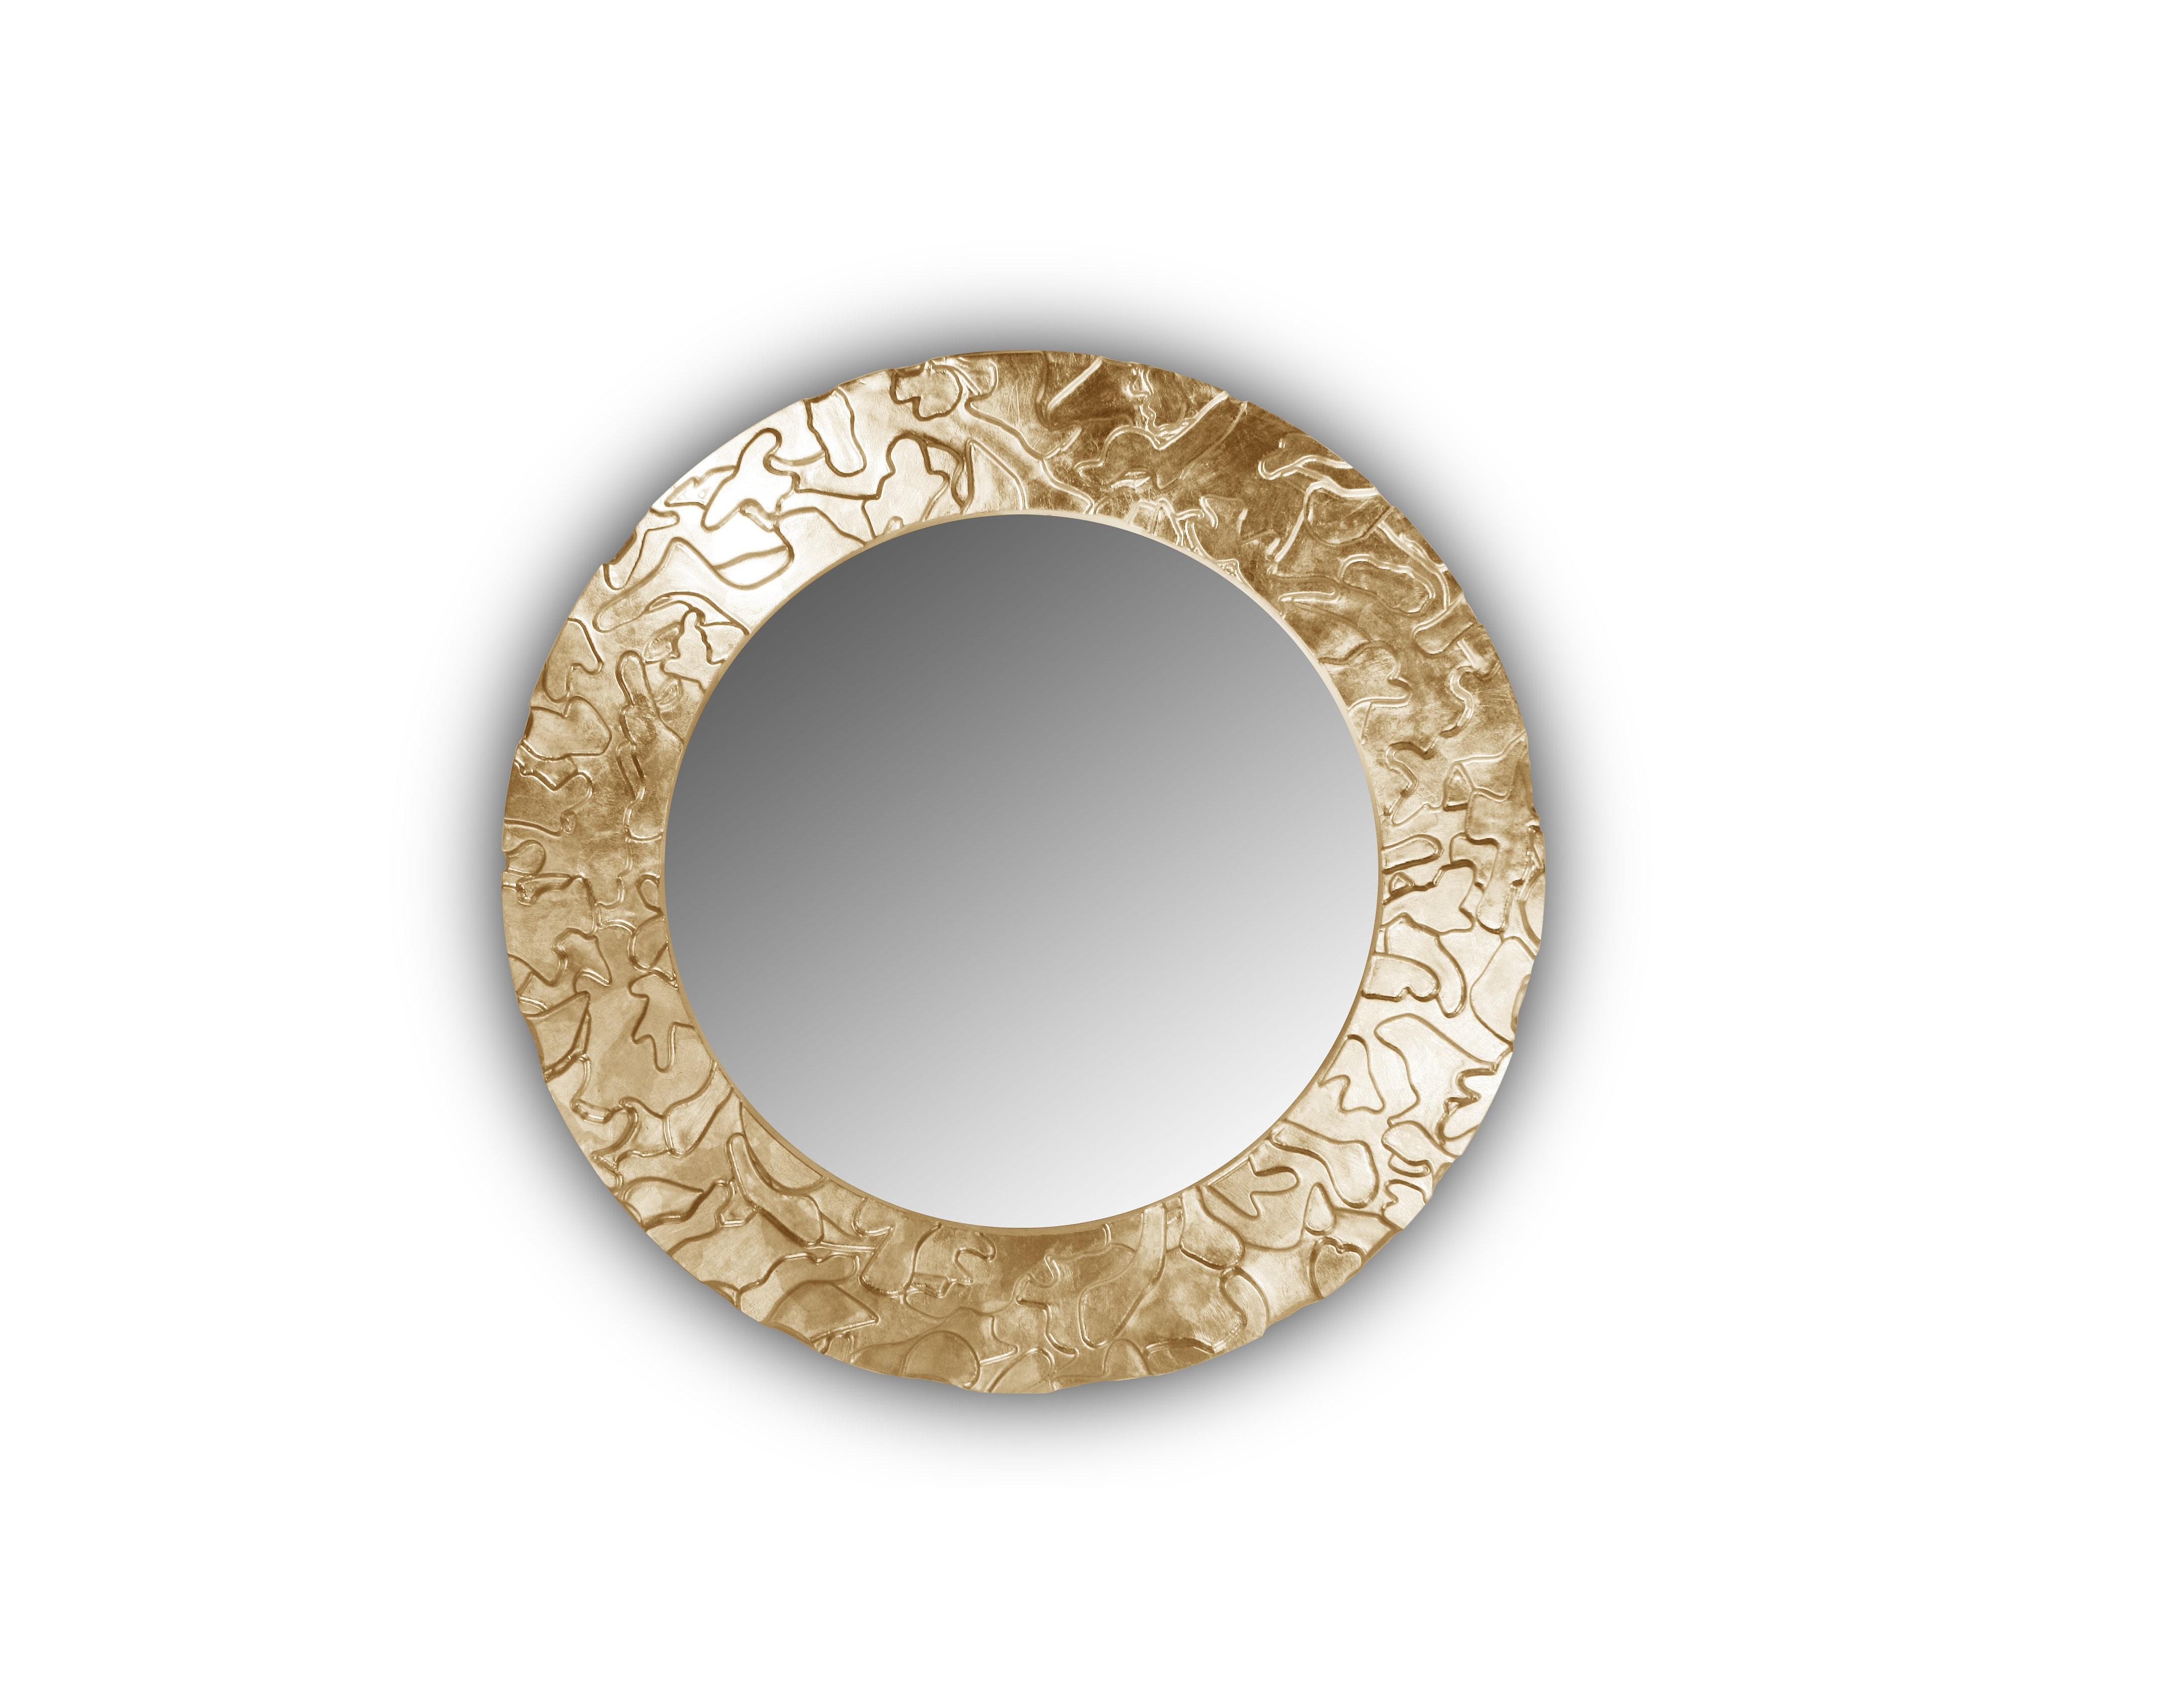 Зеркало Fashion CamouflageНастенные зеркала<br><br><br>Material: Дерево<br>Глубина см: 3